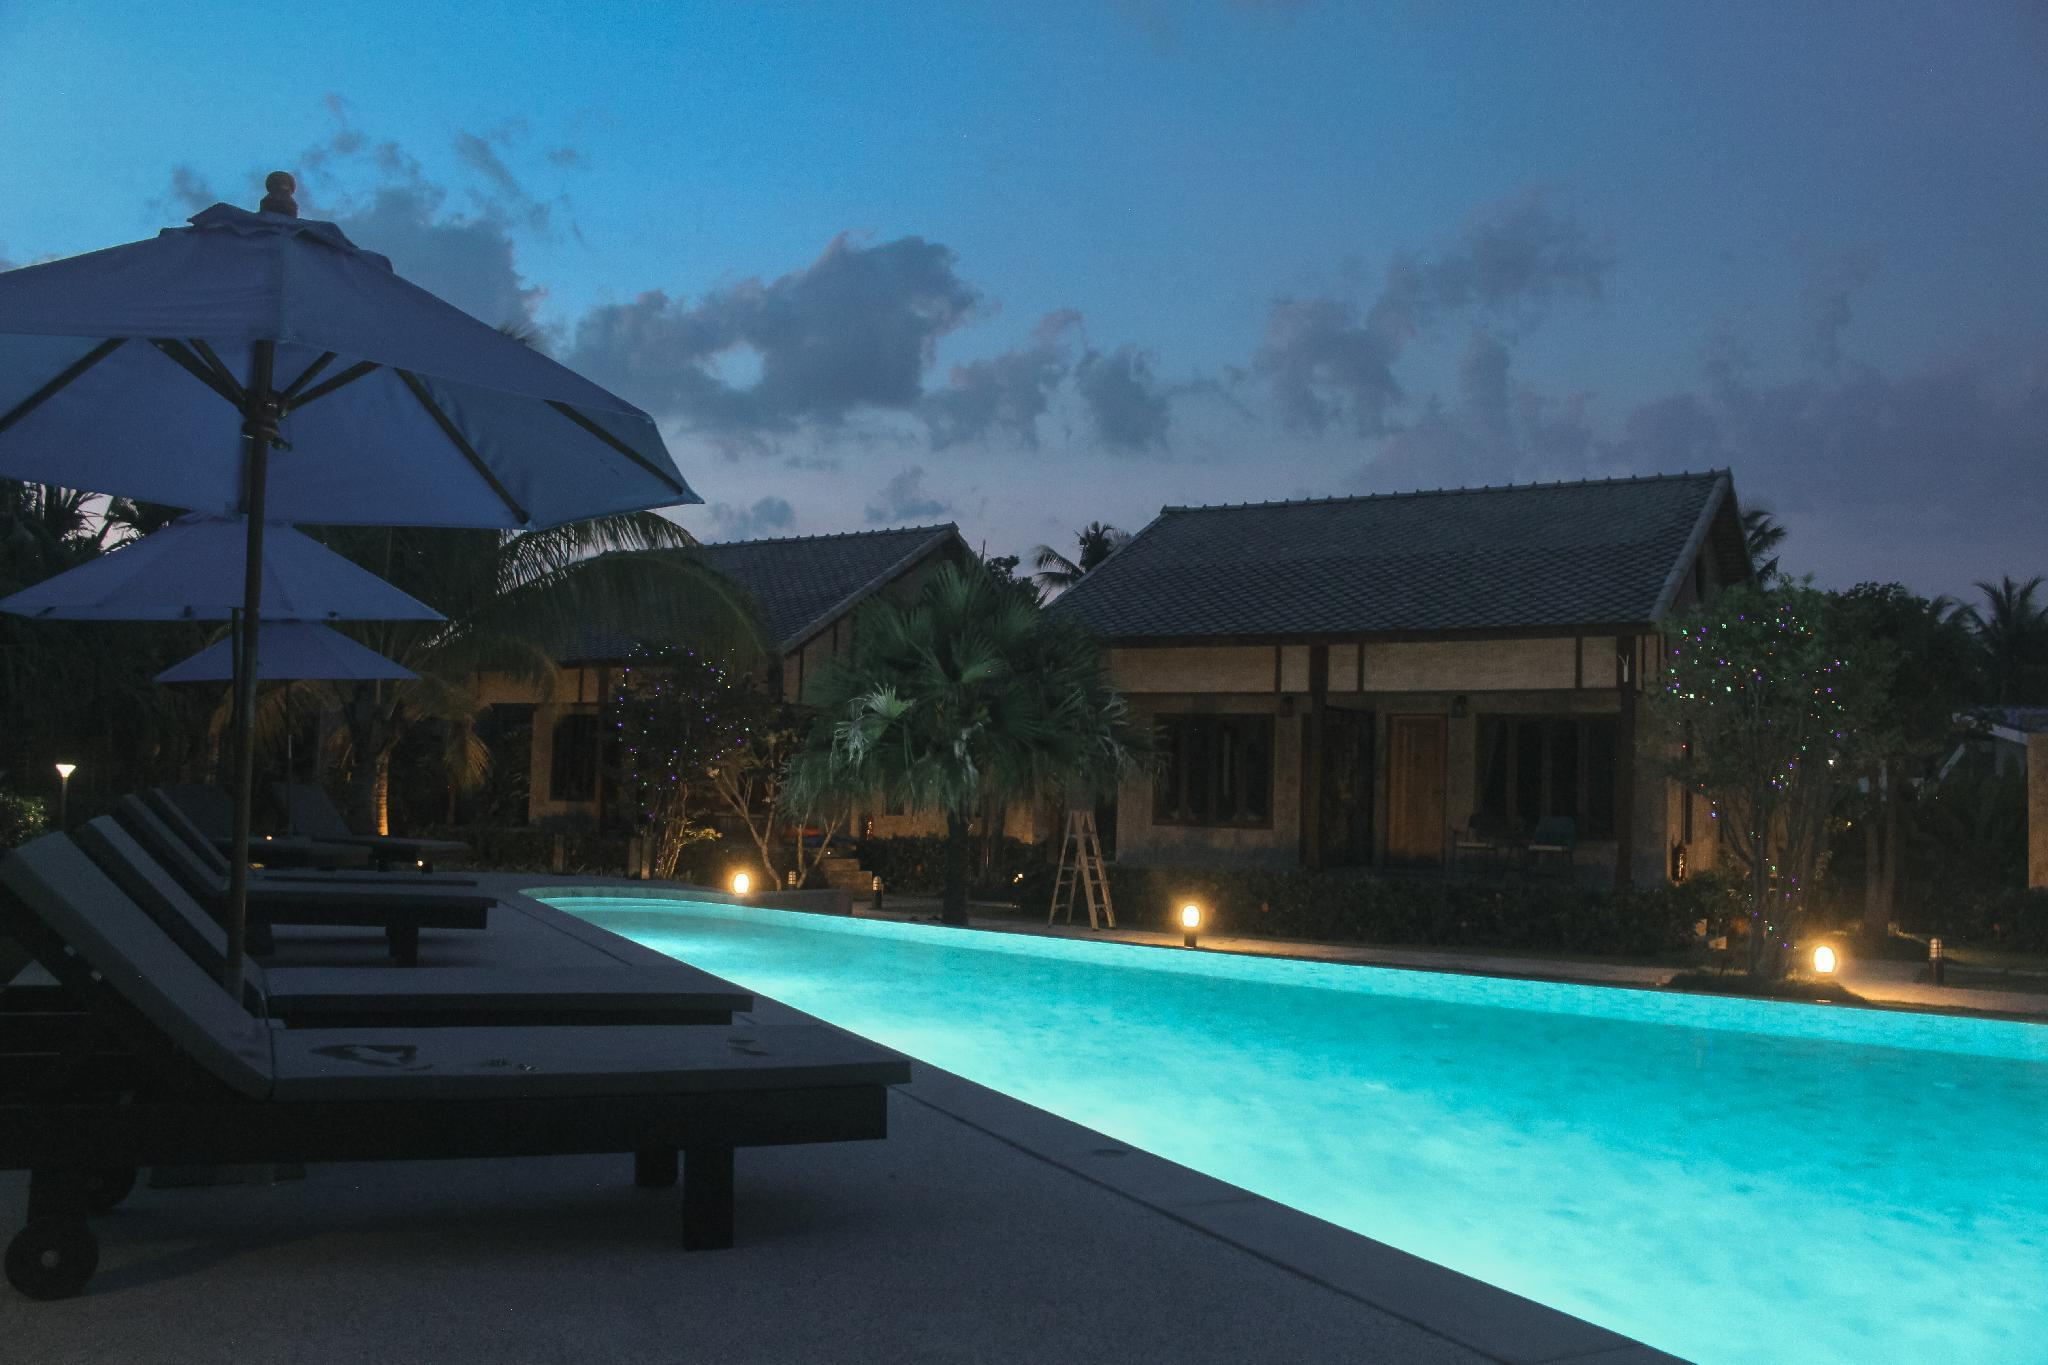 #I Pool LuxuryVillaFleur, a romantic haven, BF บังกะโล 1 ห้องนอน 1 ห้องน้ำส่วนตัว ขนาด 35 ตร.ม. – หาดคลองดาว/หาดพระแอ